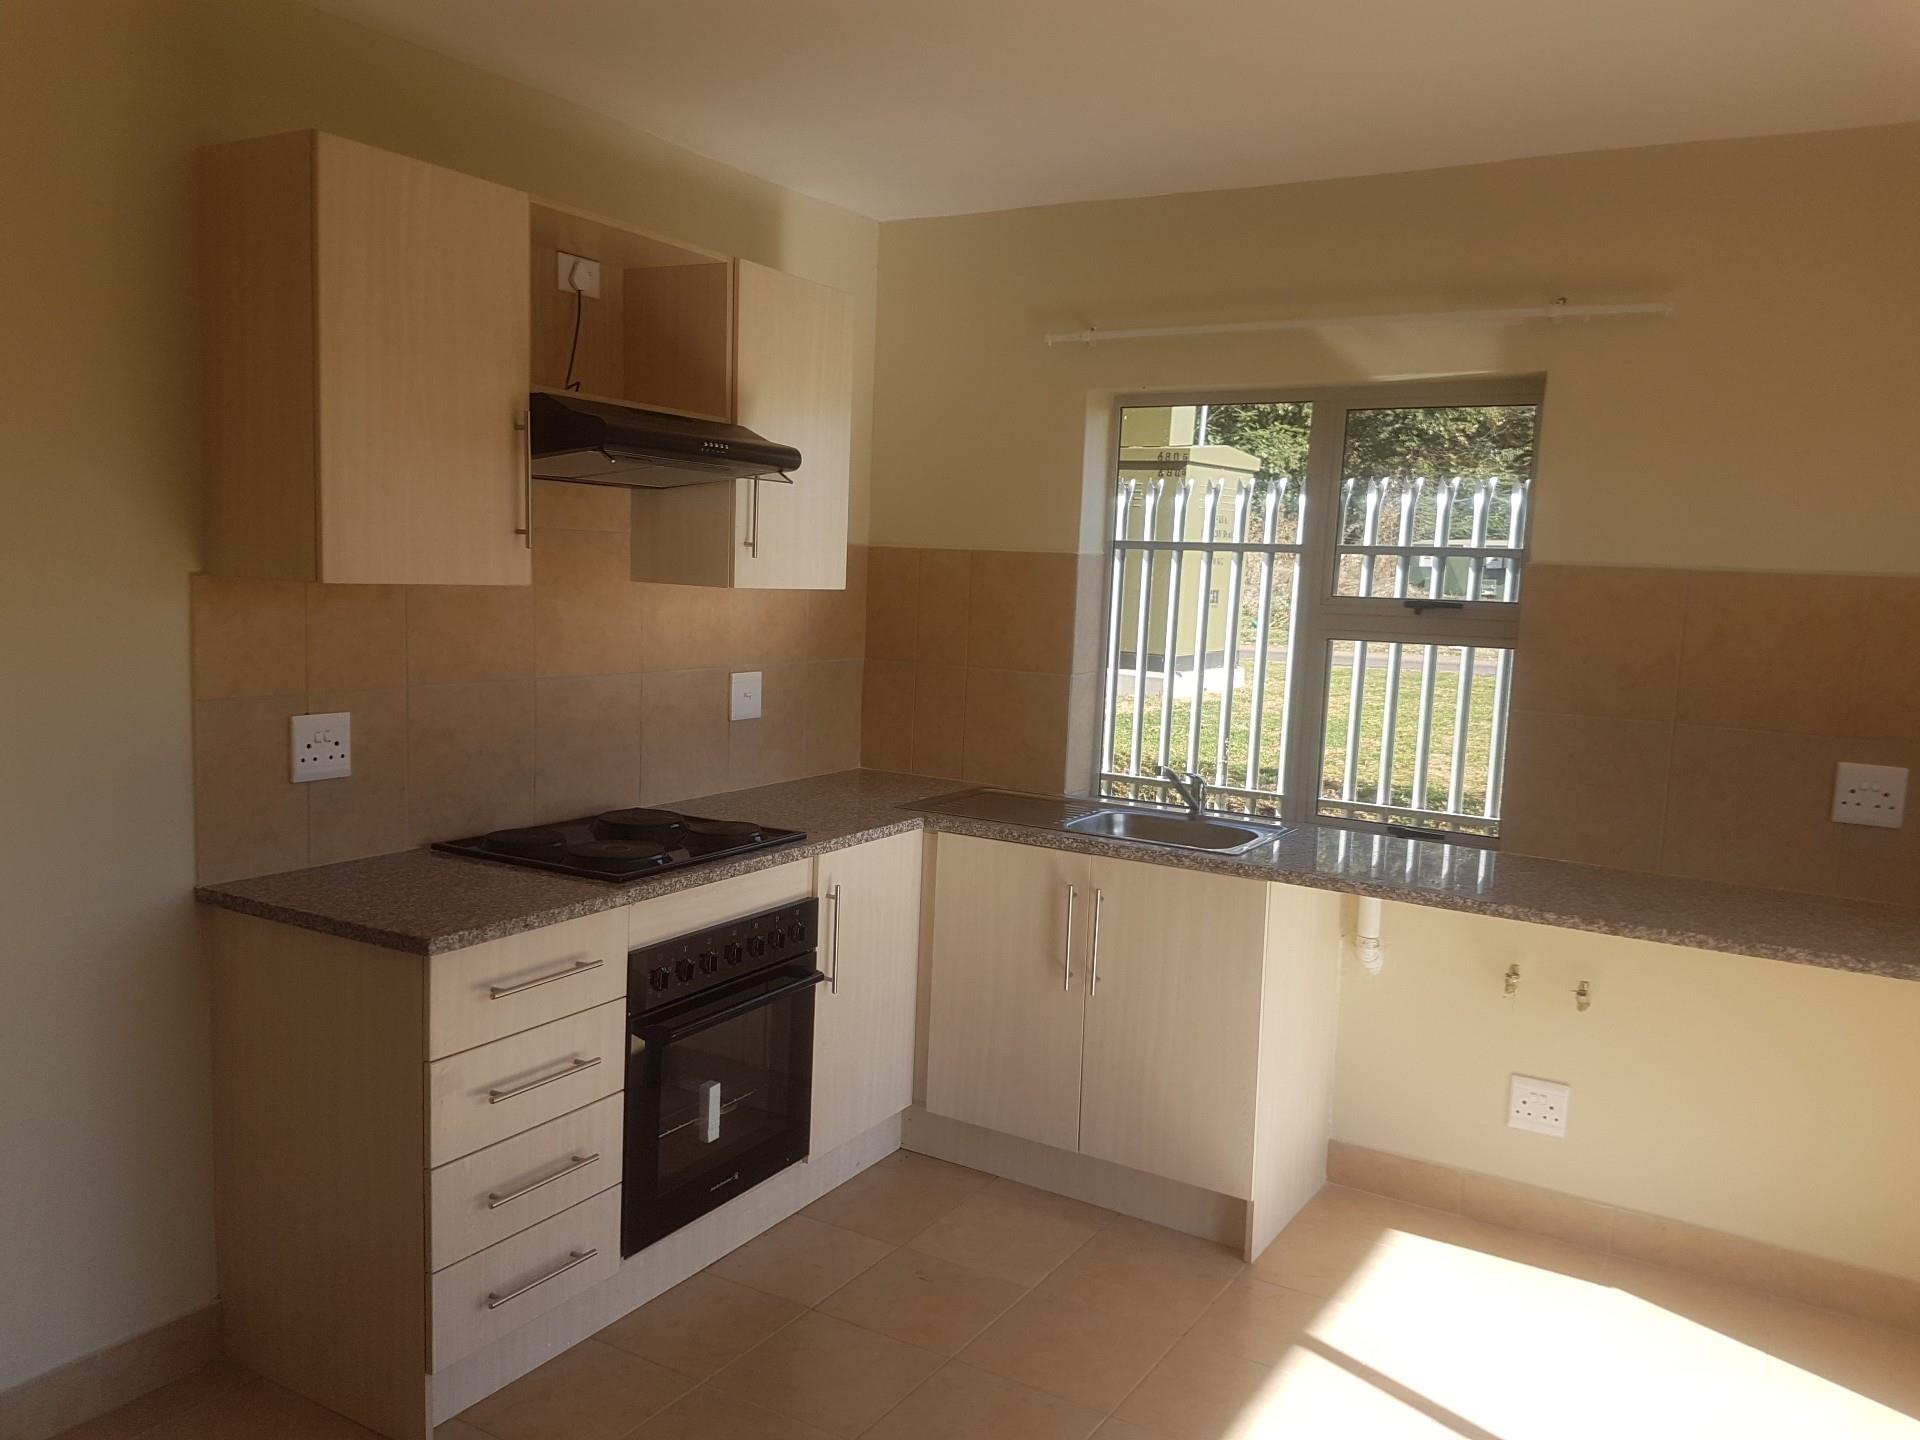 2 Bedroom Apartment To Rent in Pretoria North | RE/MAX™ of ...